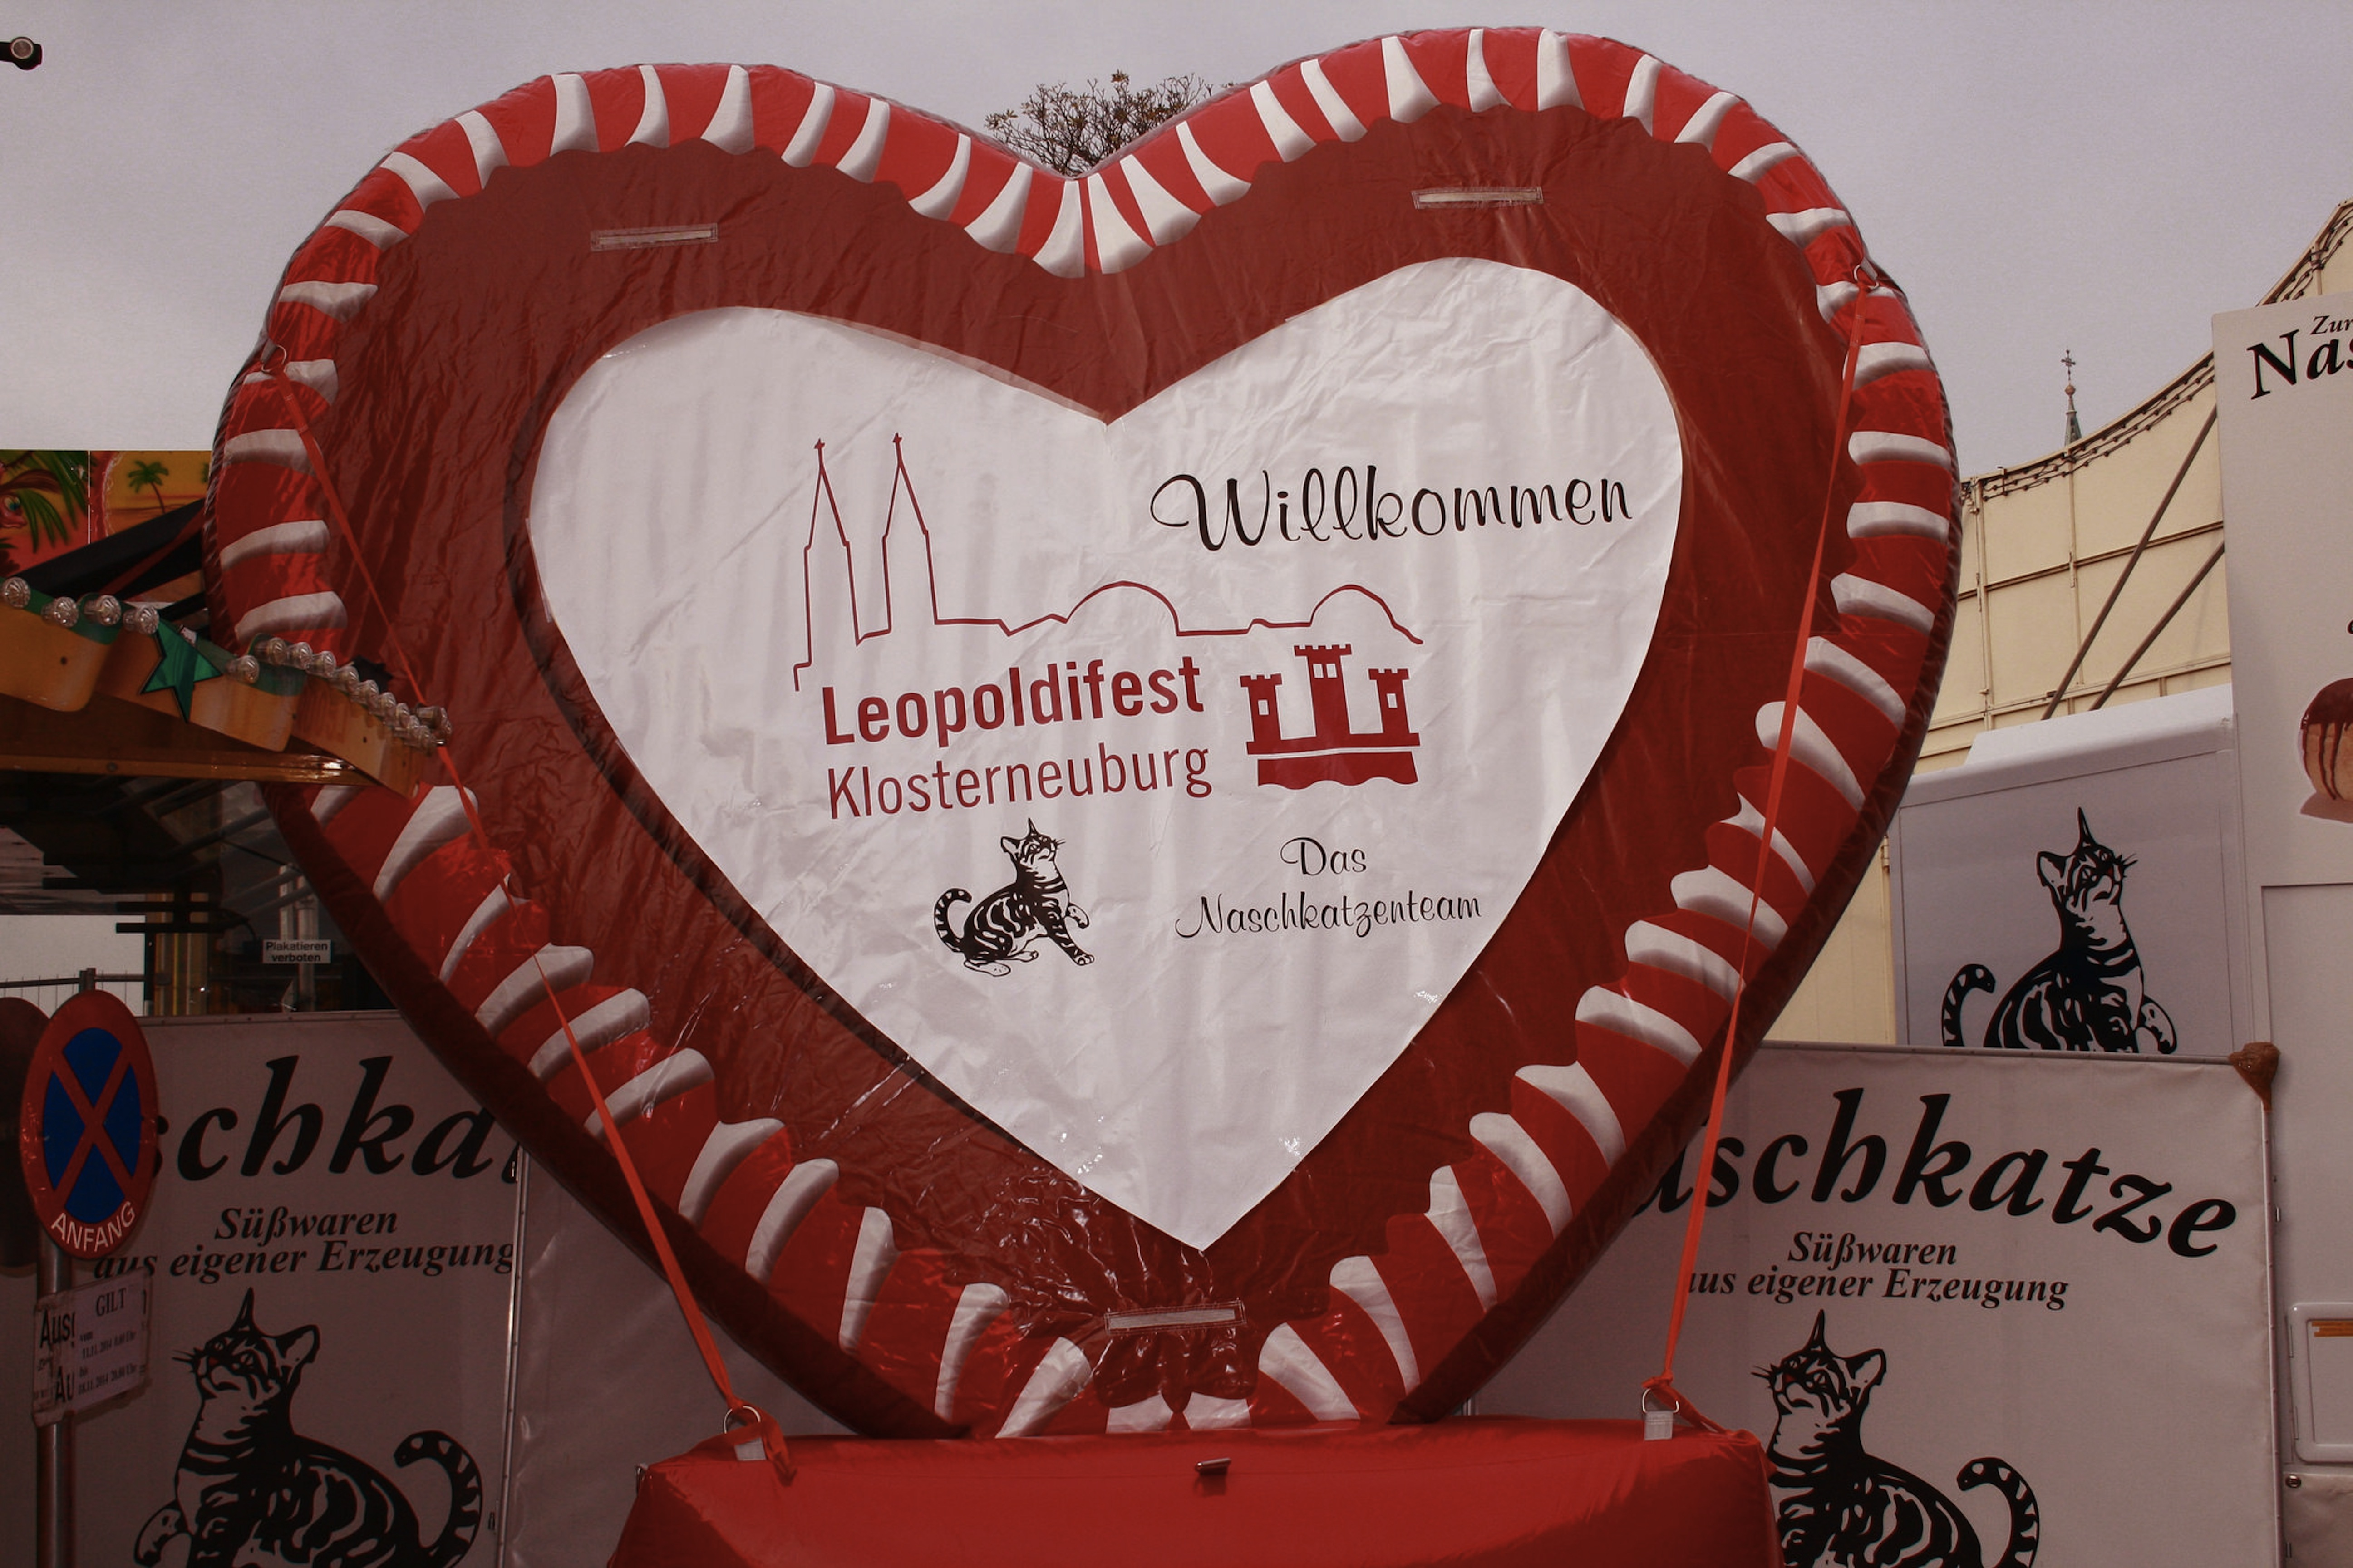 Leopoldi.jpg